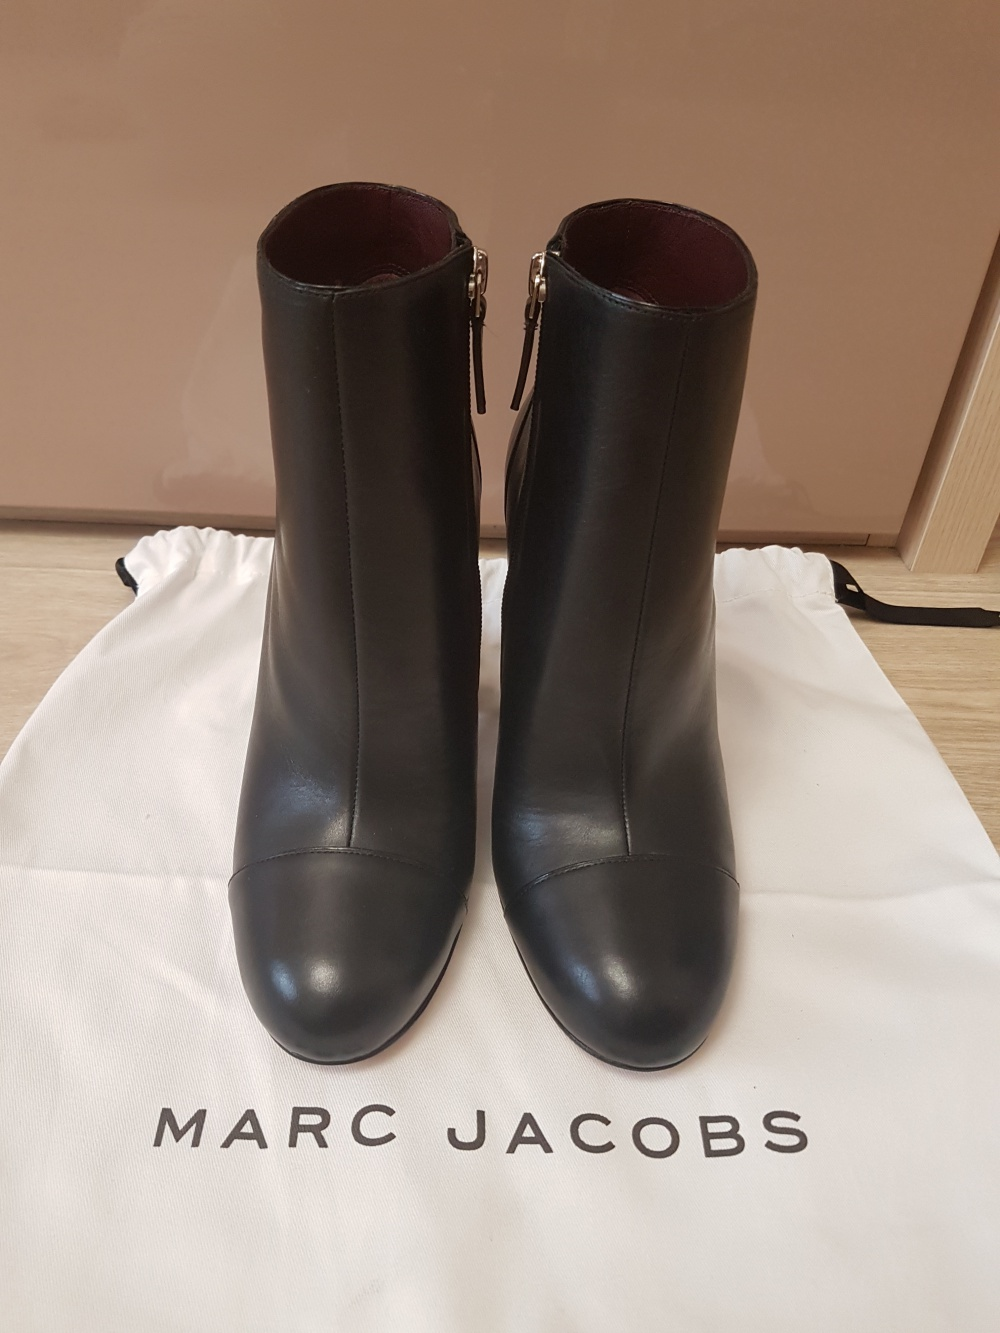 Сапожки (ботильоны) Marc Jacobs, размер 39